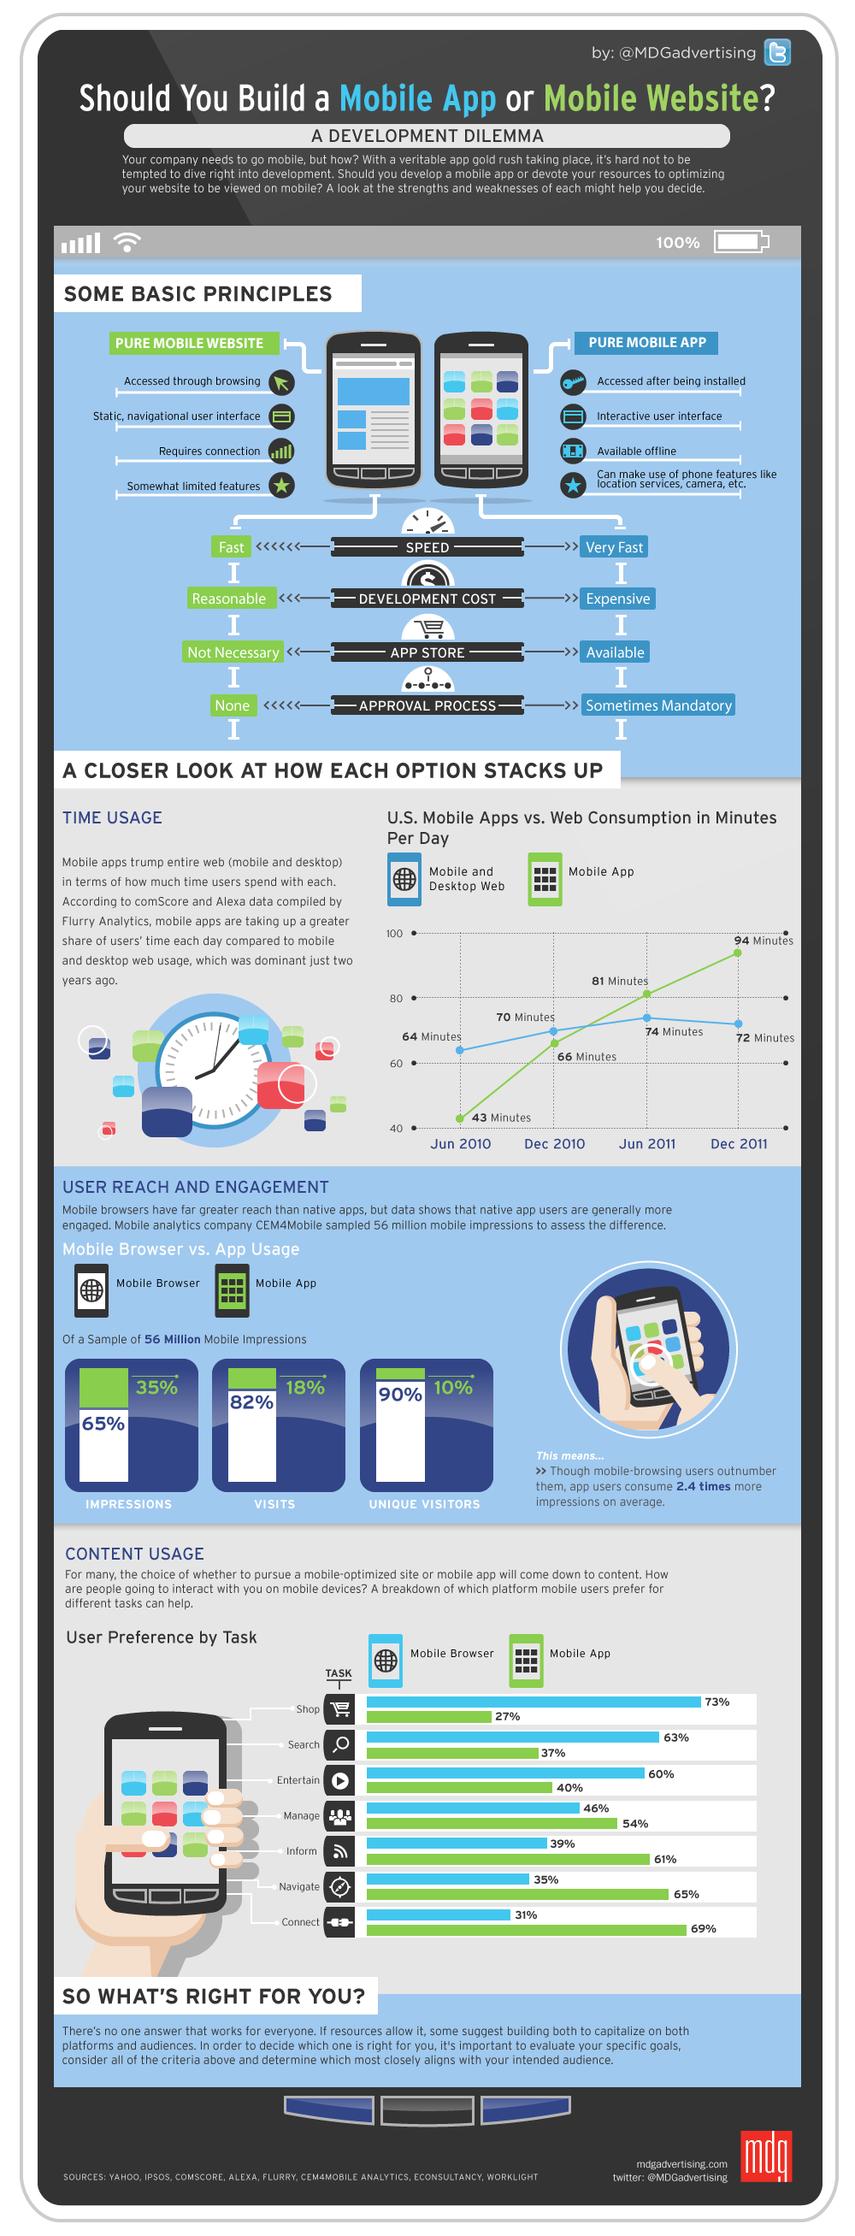 Should You Build a Mobile App or Mobile Website?